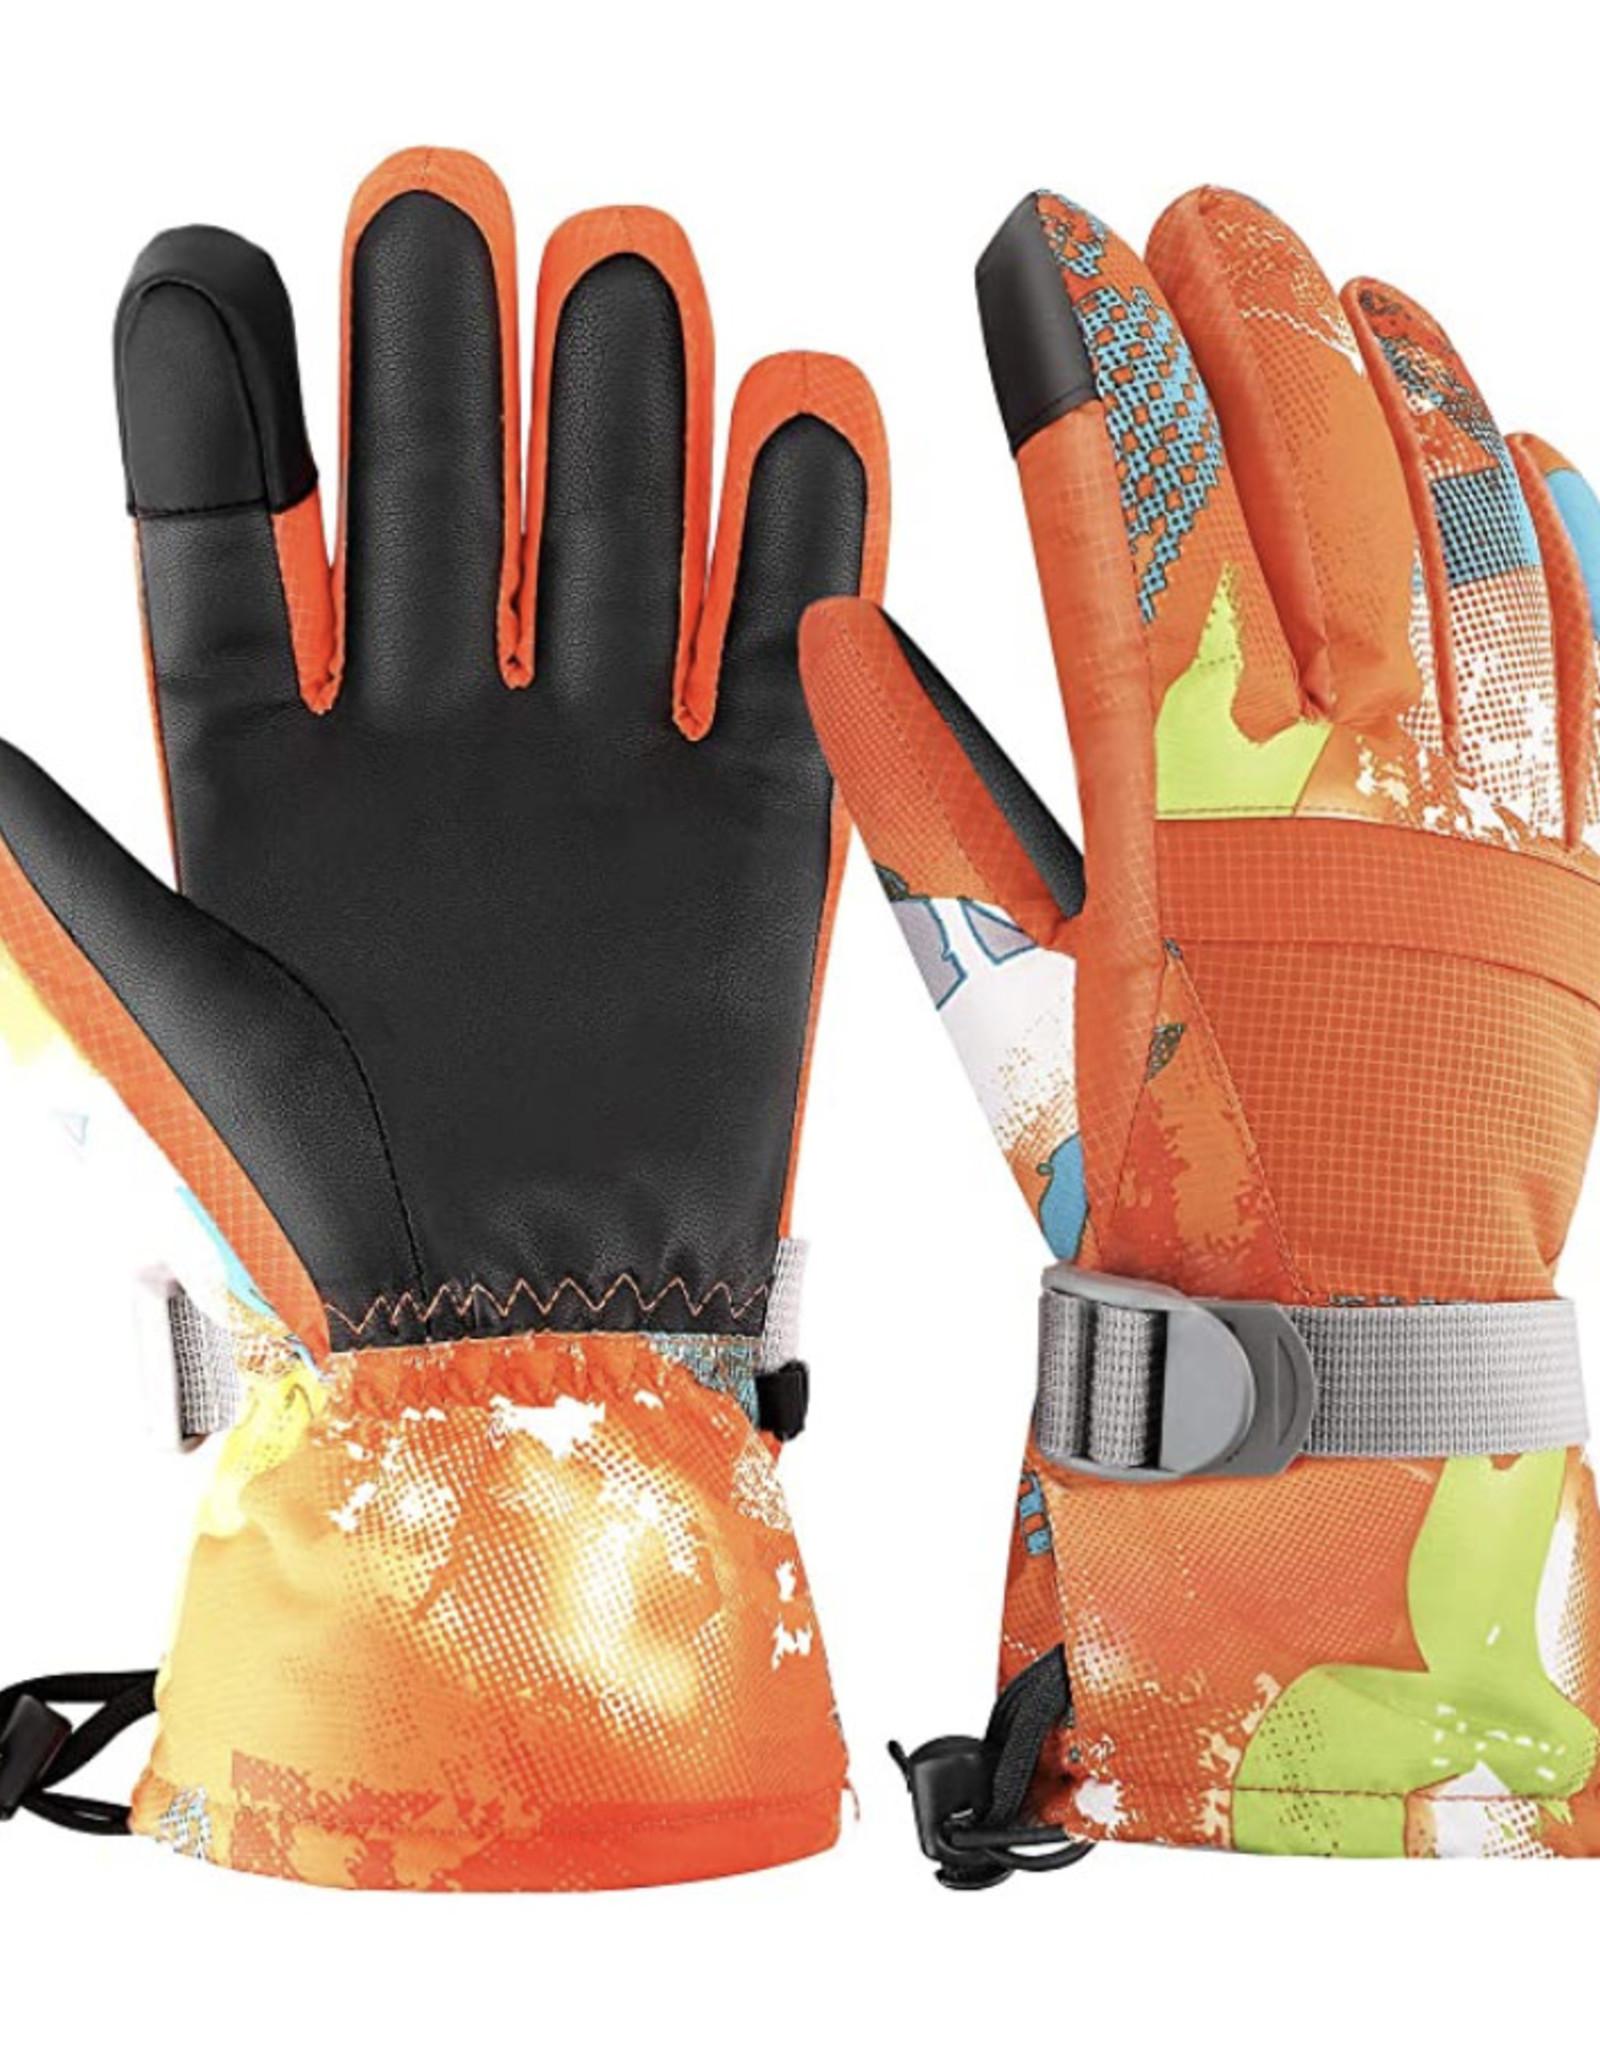 Park Rat Orange is Black Glove